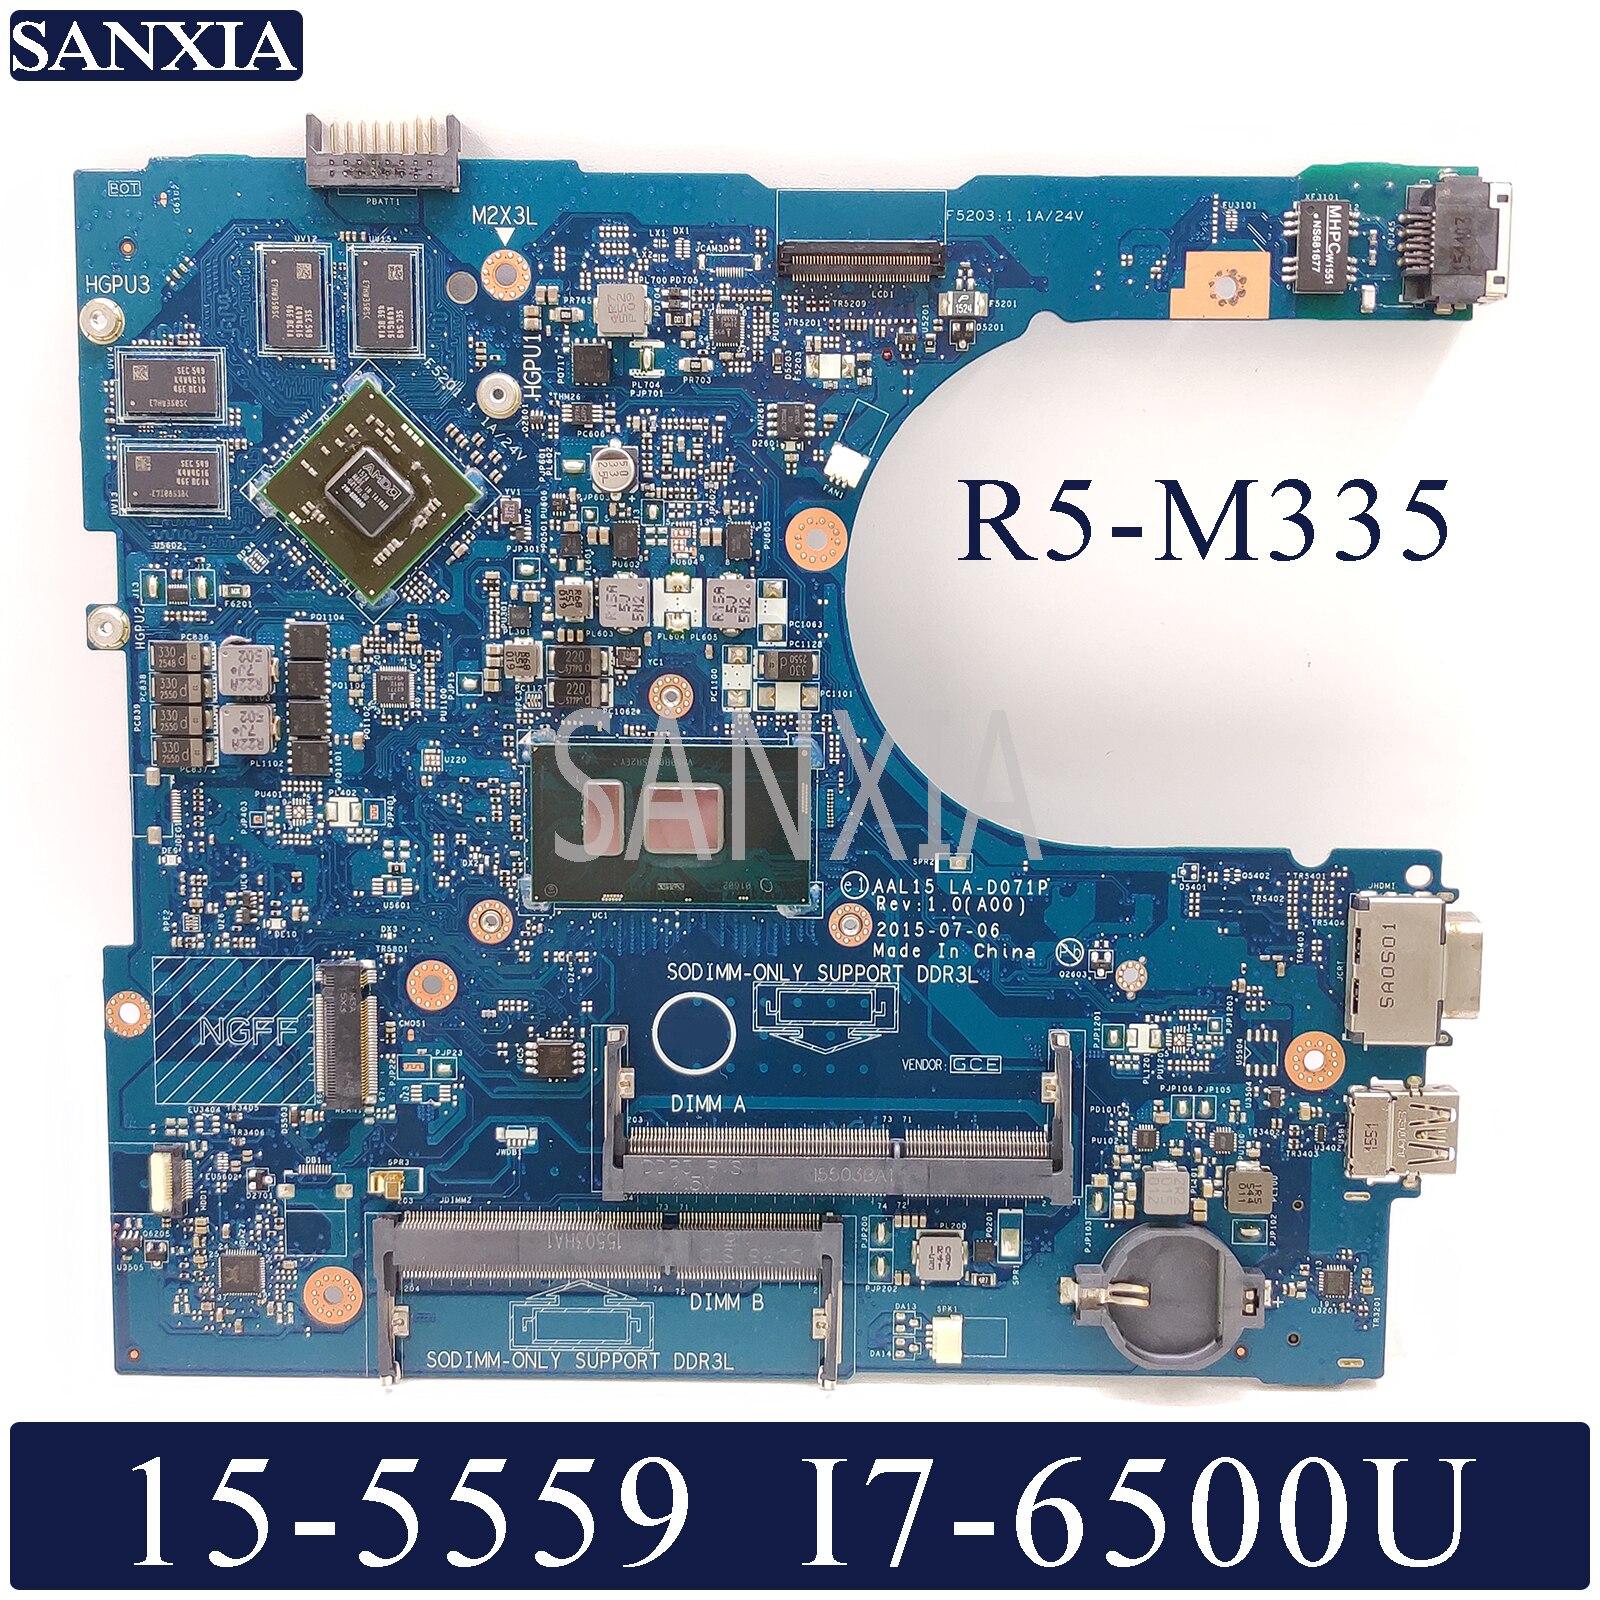 KEFU LA D071P Laptop motherboard for Dell Inspiron 15 5559 original mainboard I7 6500U R5 M335